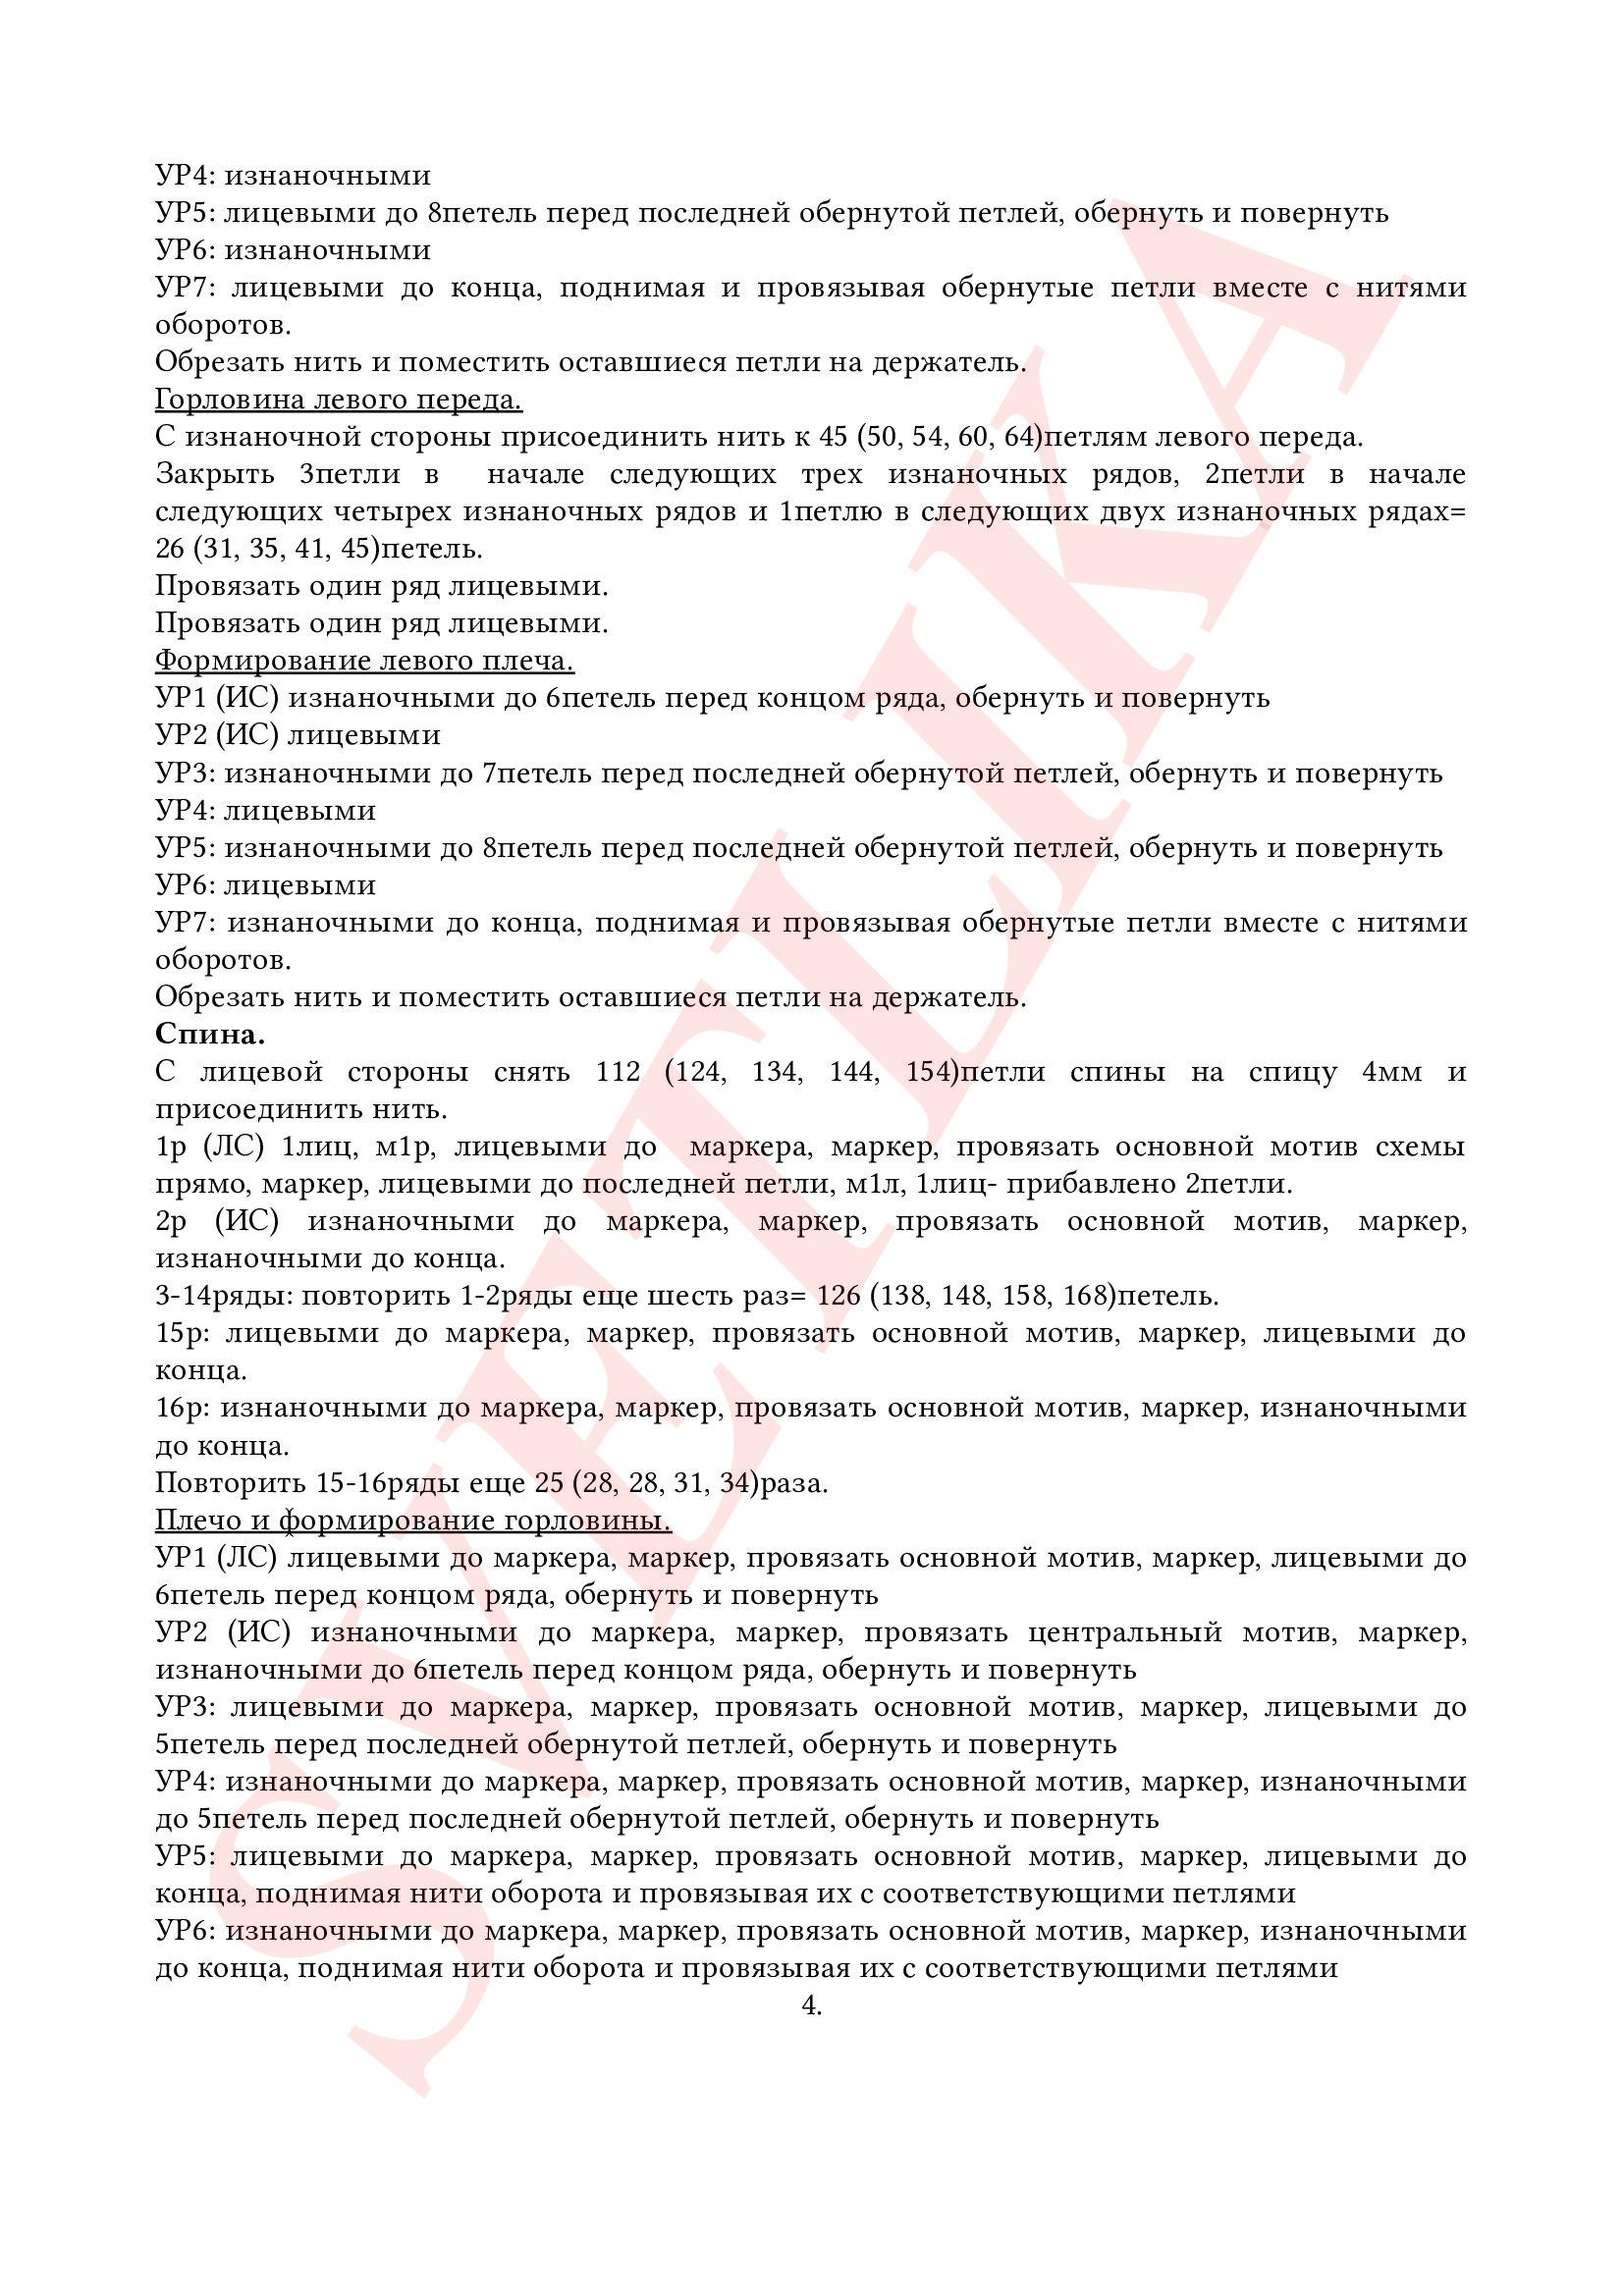 https://img-fotki.yandex.ru/get/195431/125862467.aa/0_1bcb69_c7265282_orig